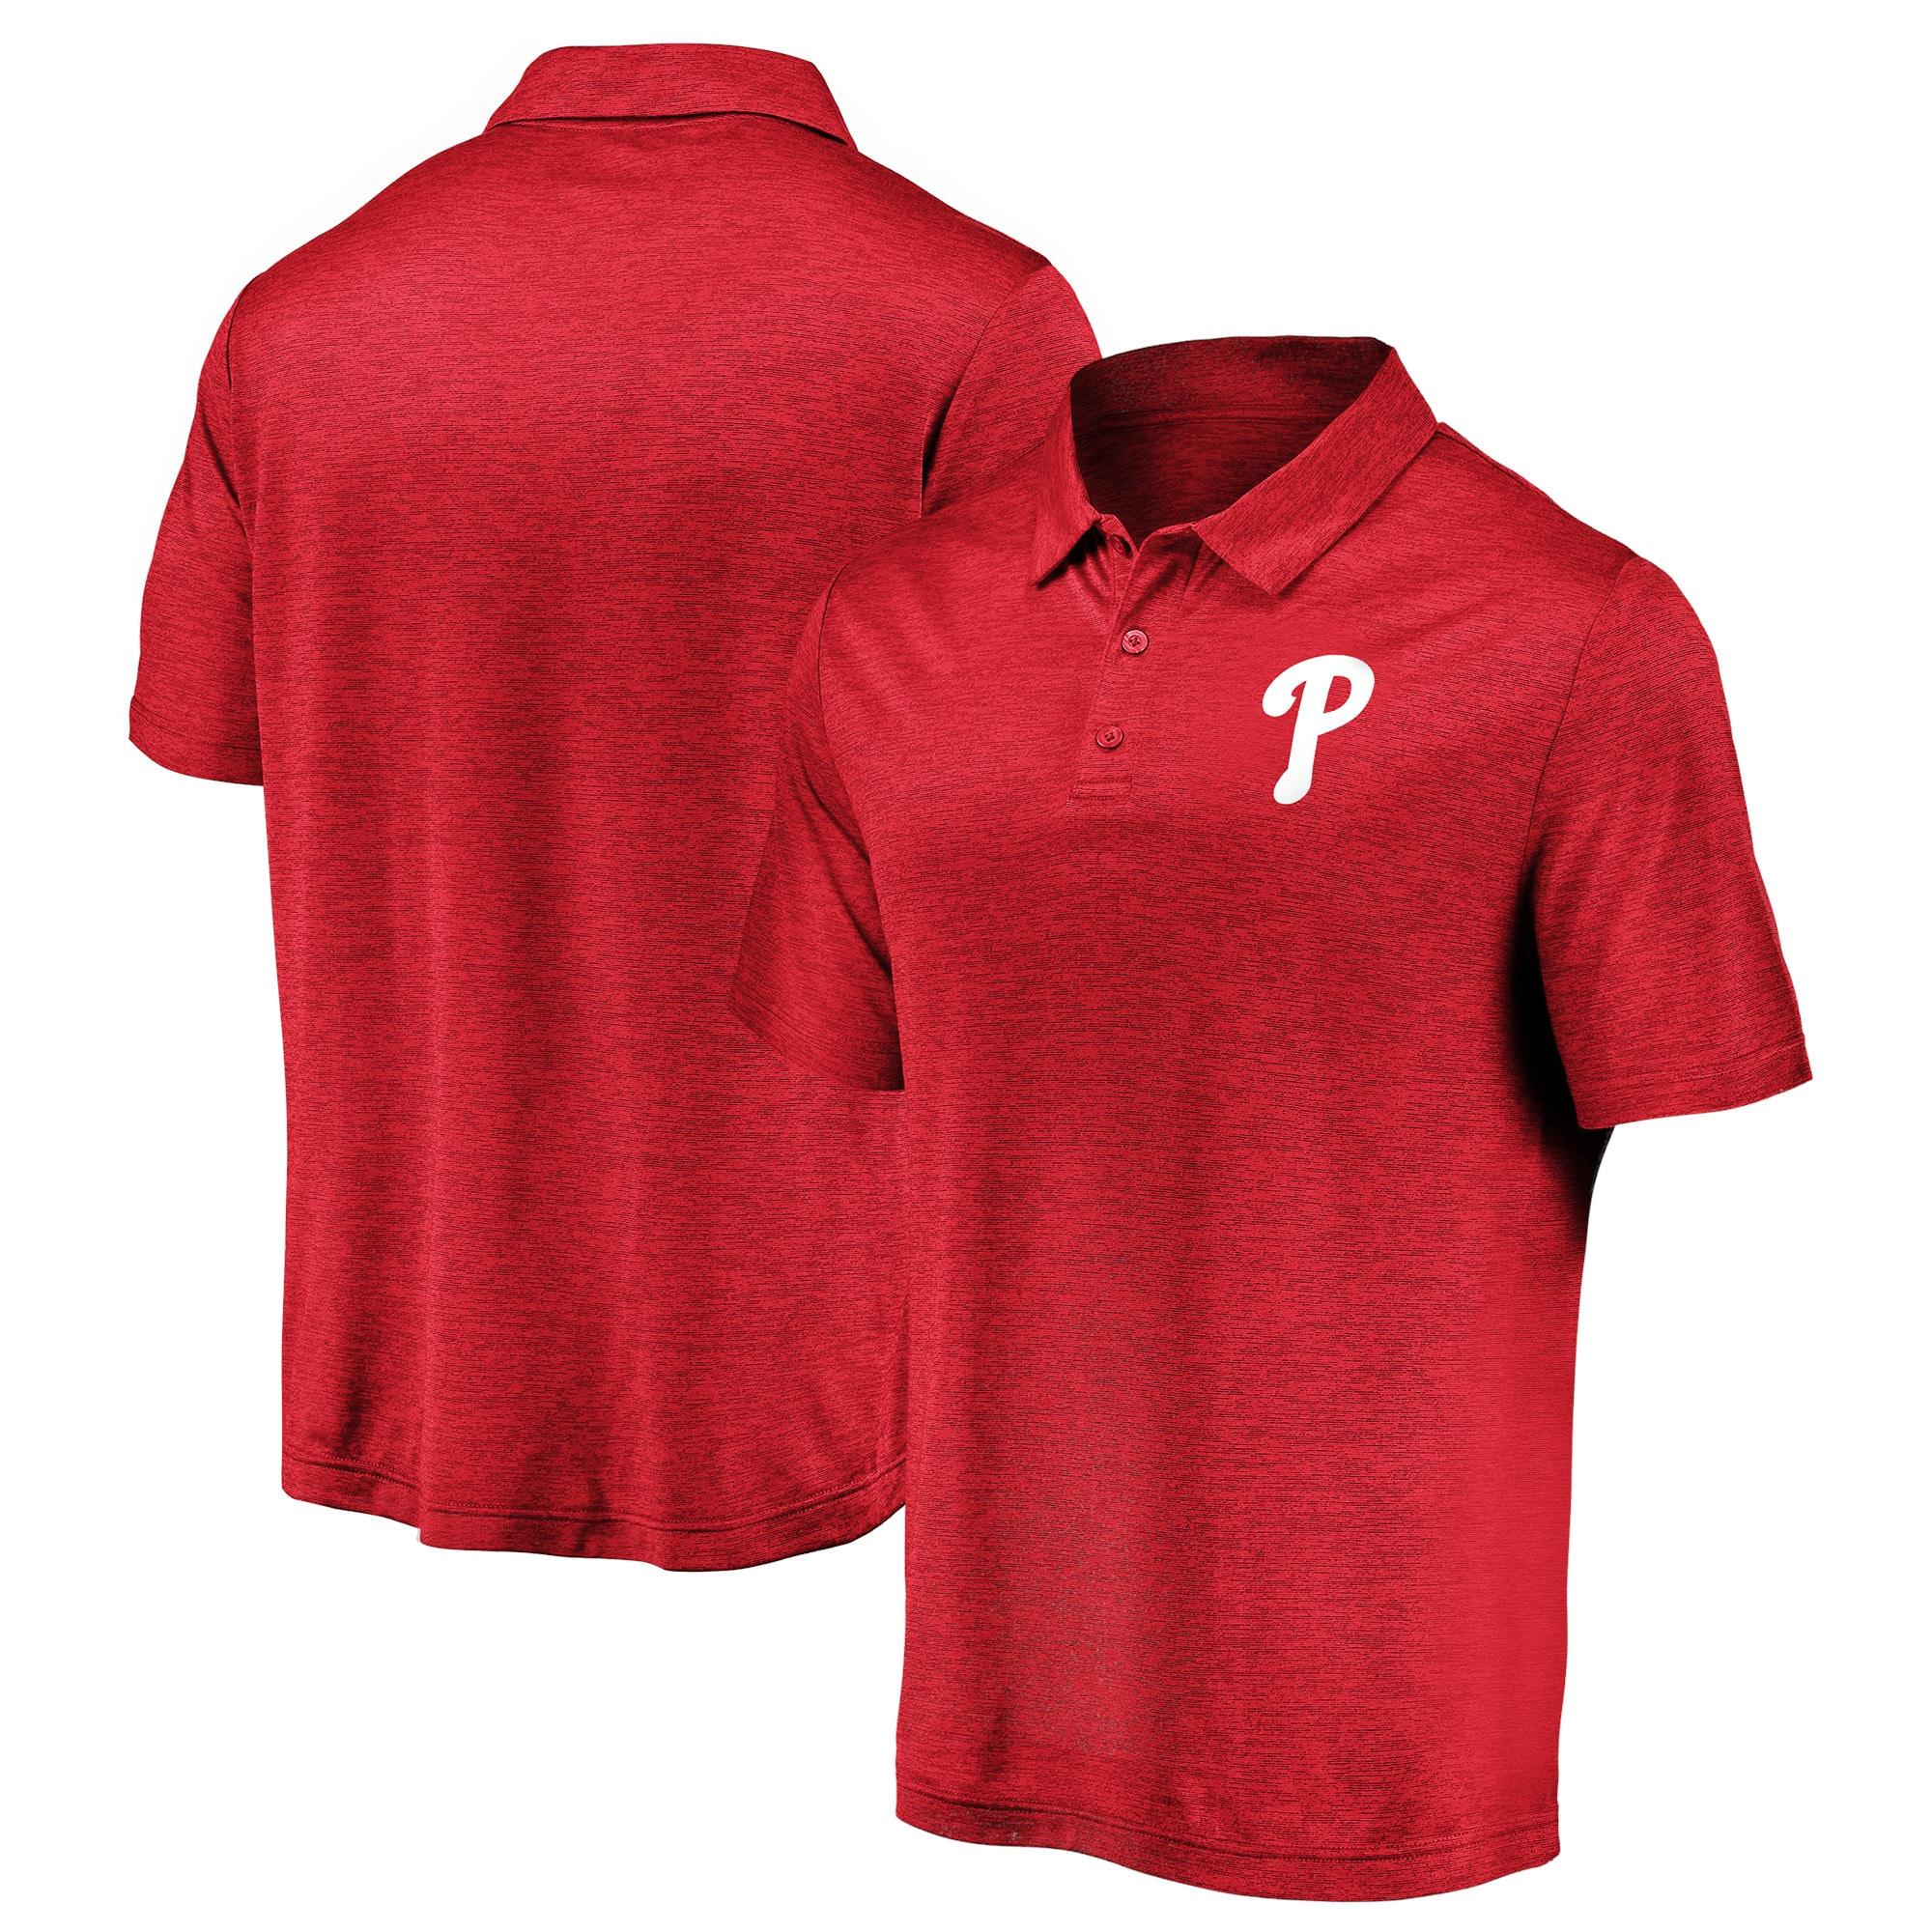 Philadelphia Phillies Fanatics Branded Iconic Striated Primary Logo Polo - Red